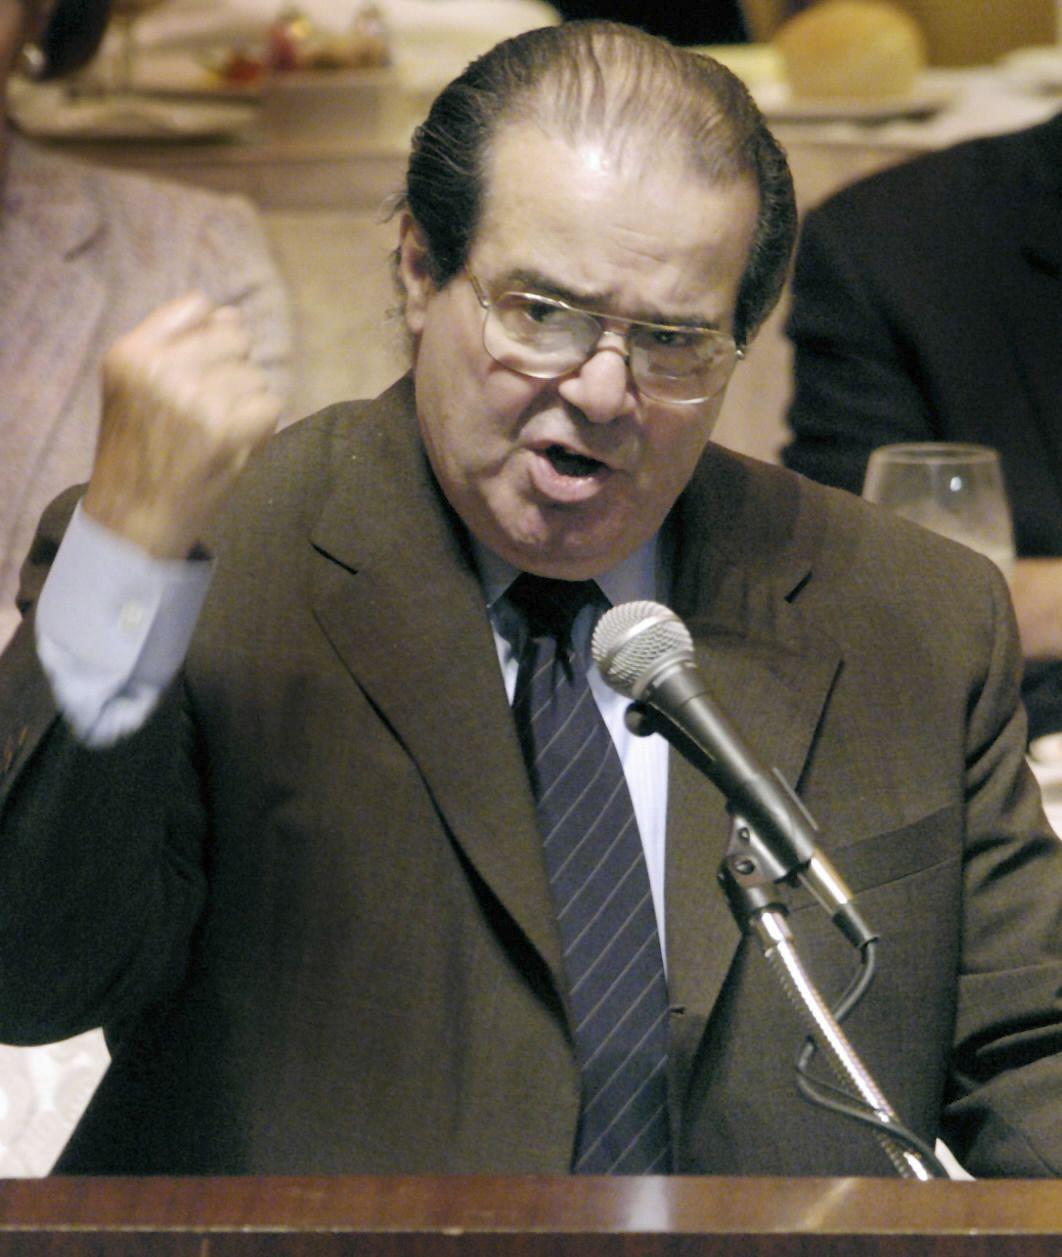 Scalia's extraordinary legacy